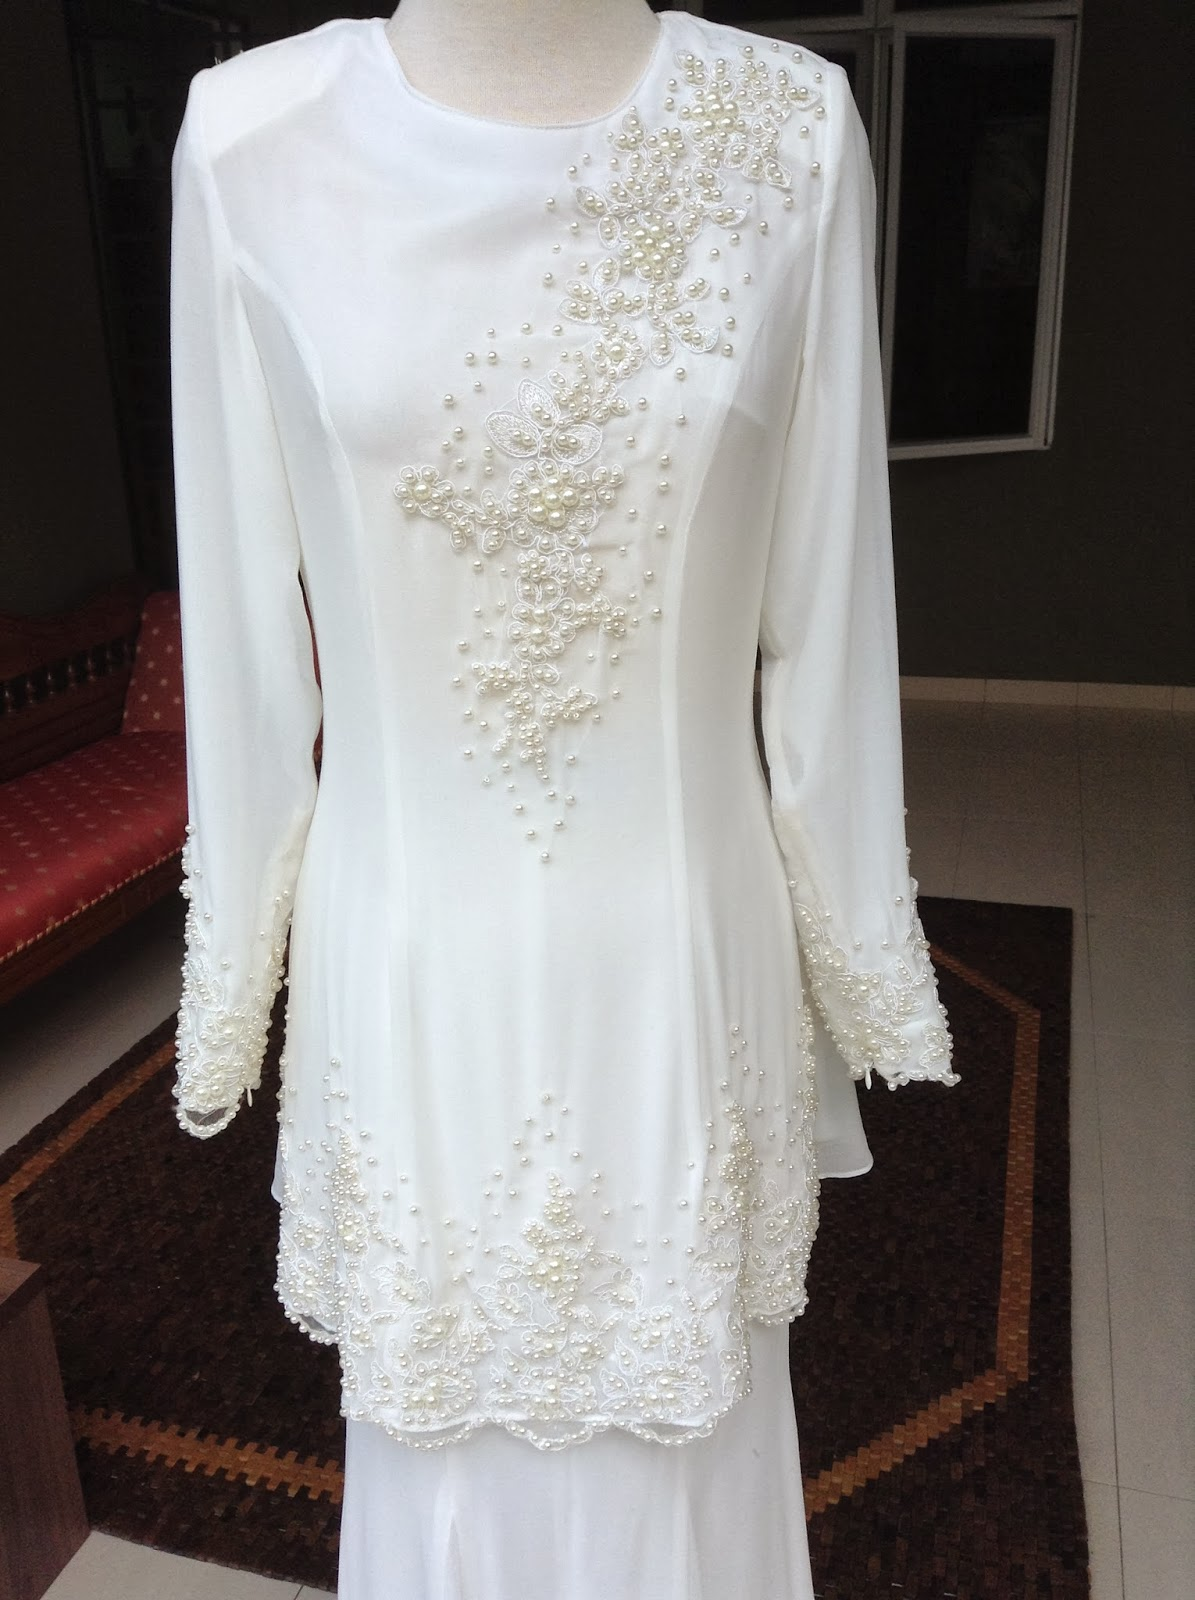 Baju Akad Nikah Tunang Putih My Wedding Dress